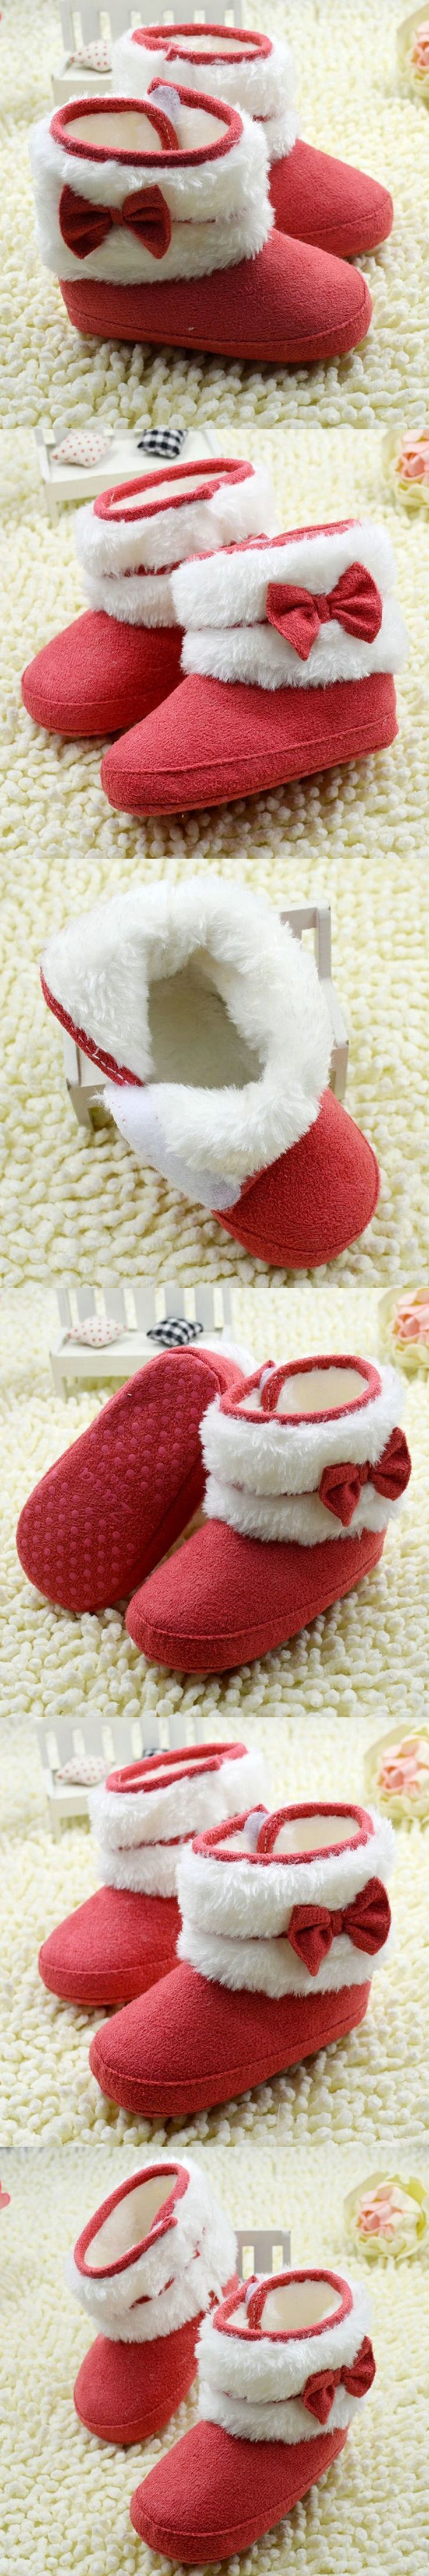 Cute Newborn Infant Baby Girl Bowknot Winter Boots Fleece Soft Crib